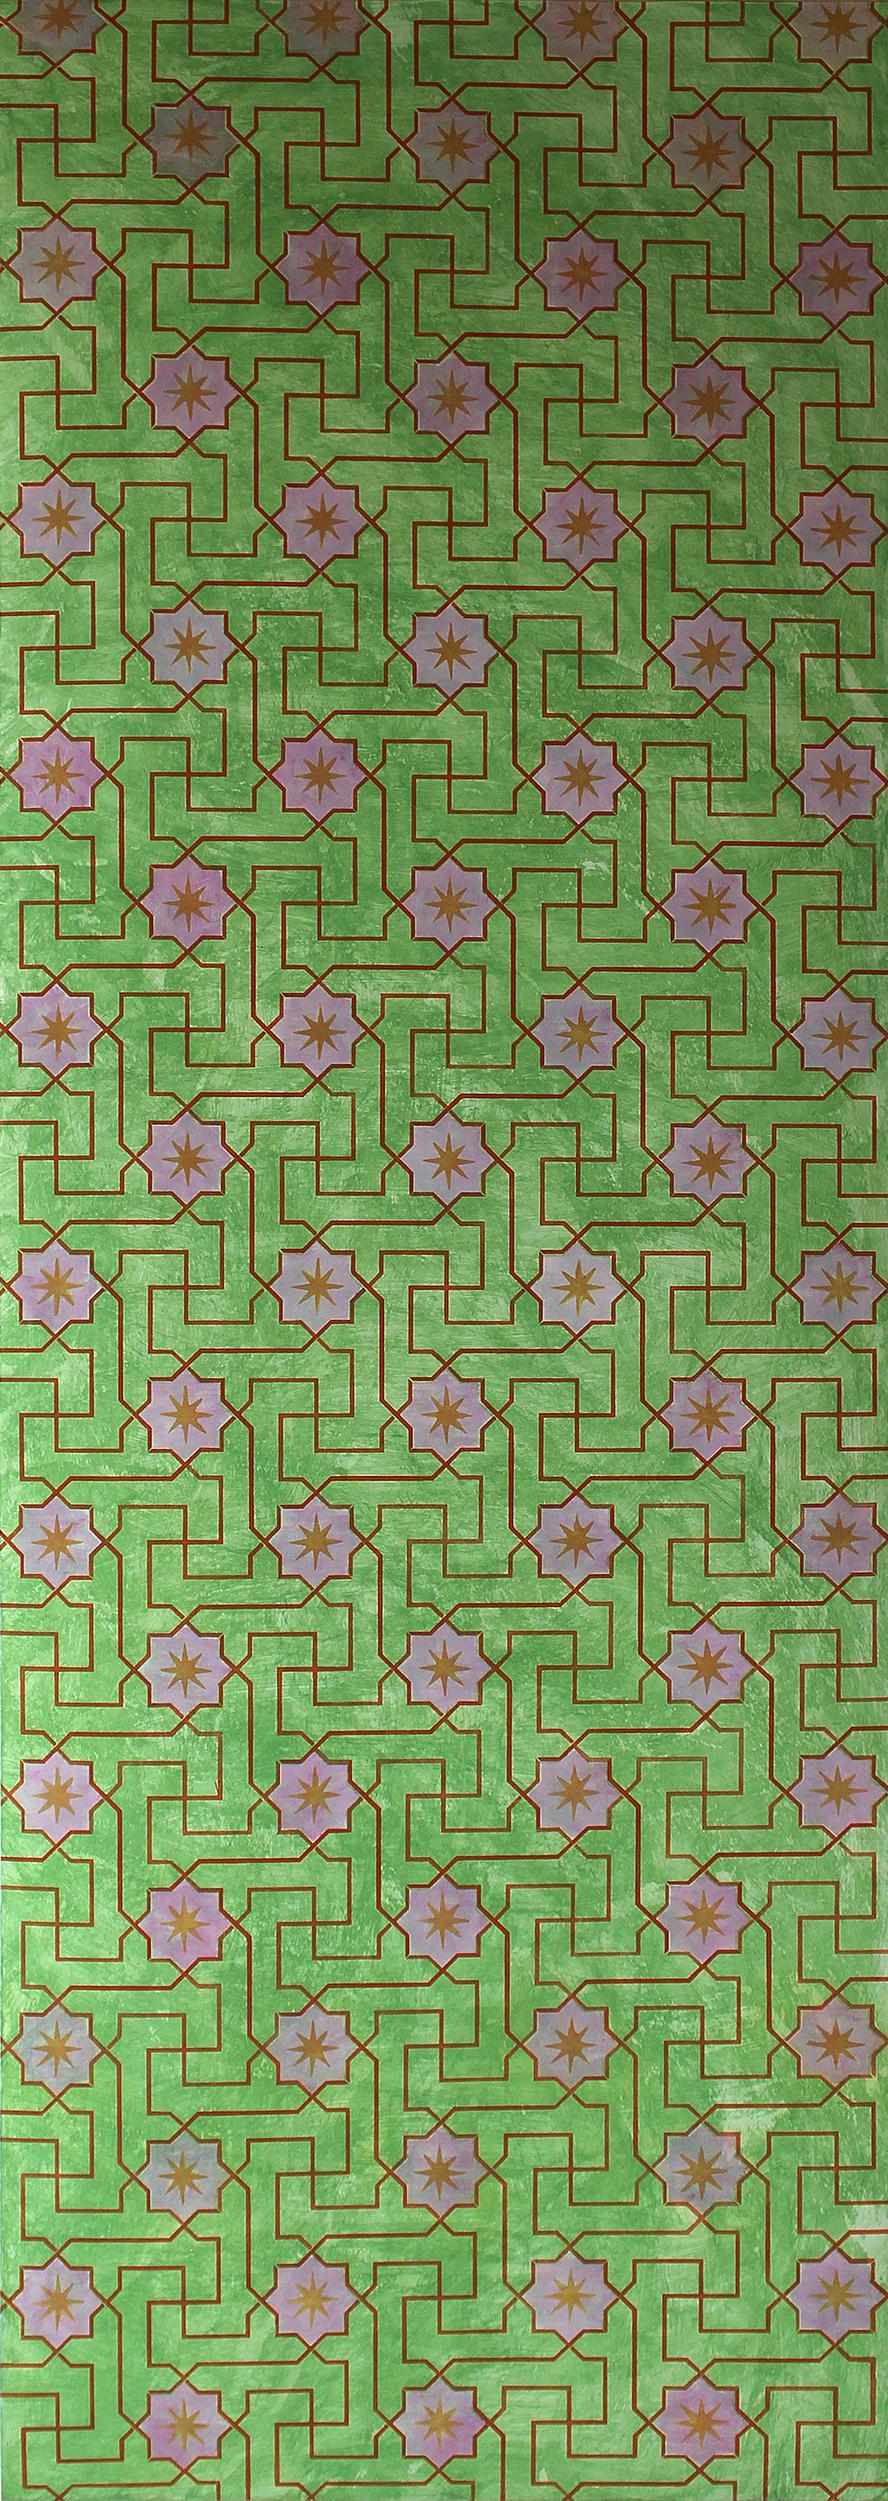 Willumsen og Alhambramønstret 19. Original håndtrykt på kraftig nonwoven tapetpapir med temperafarver. Prisen pr løbende meter er 656,-